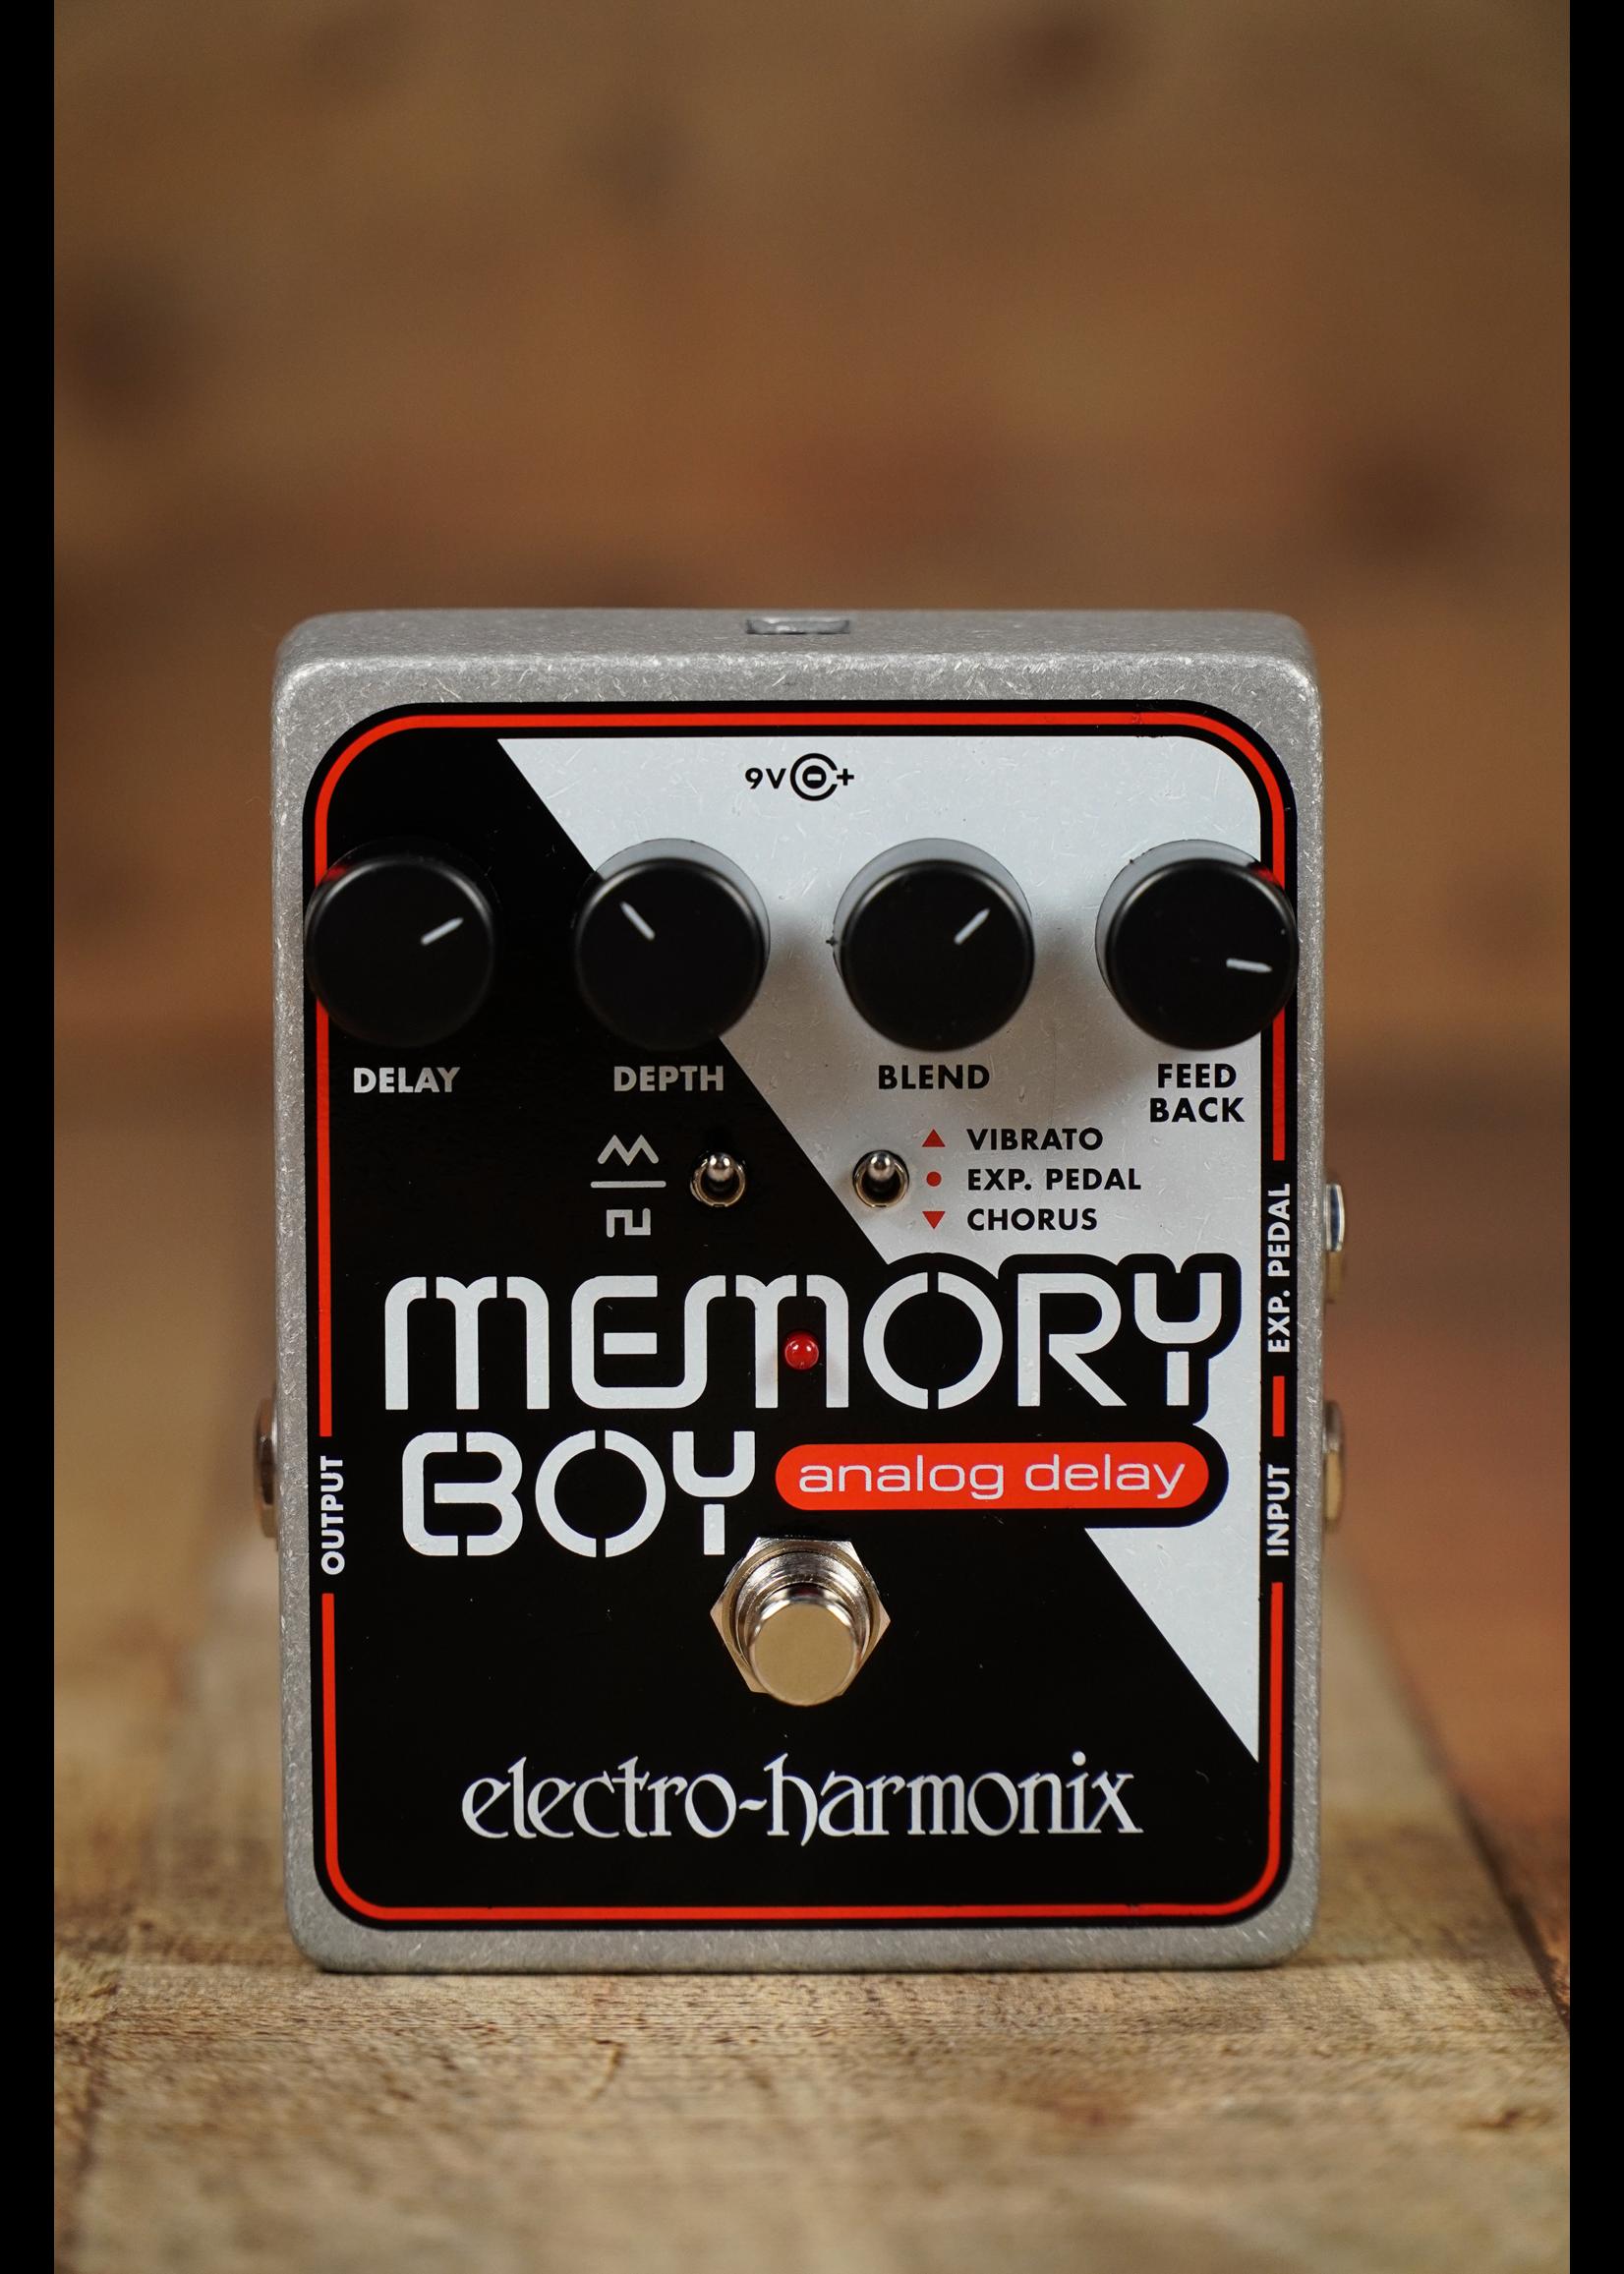 Electro-Harmonix Electro-Harmonix Memory Boy Analog Delay with Chorus & Vibrato